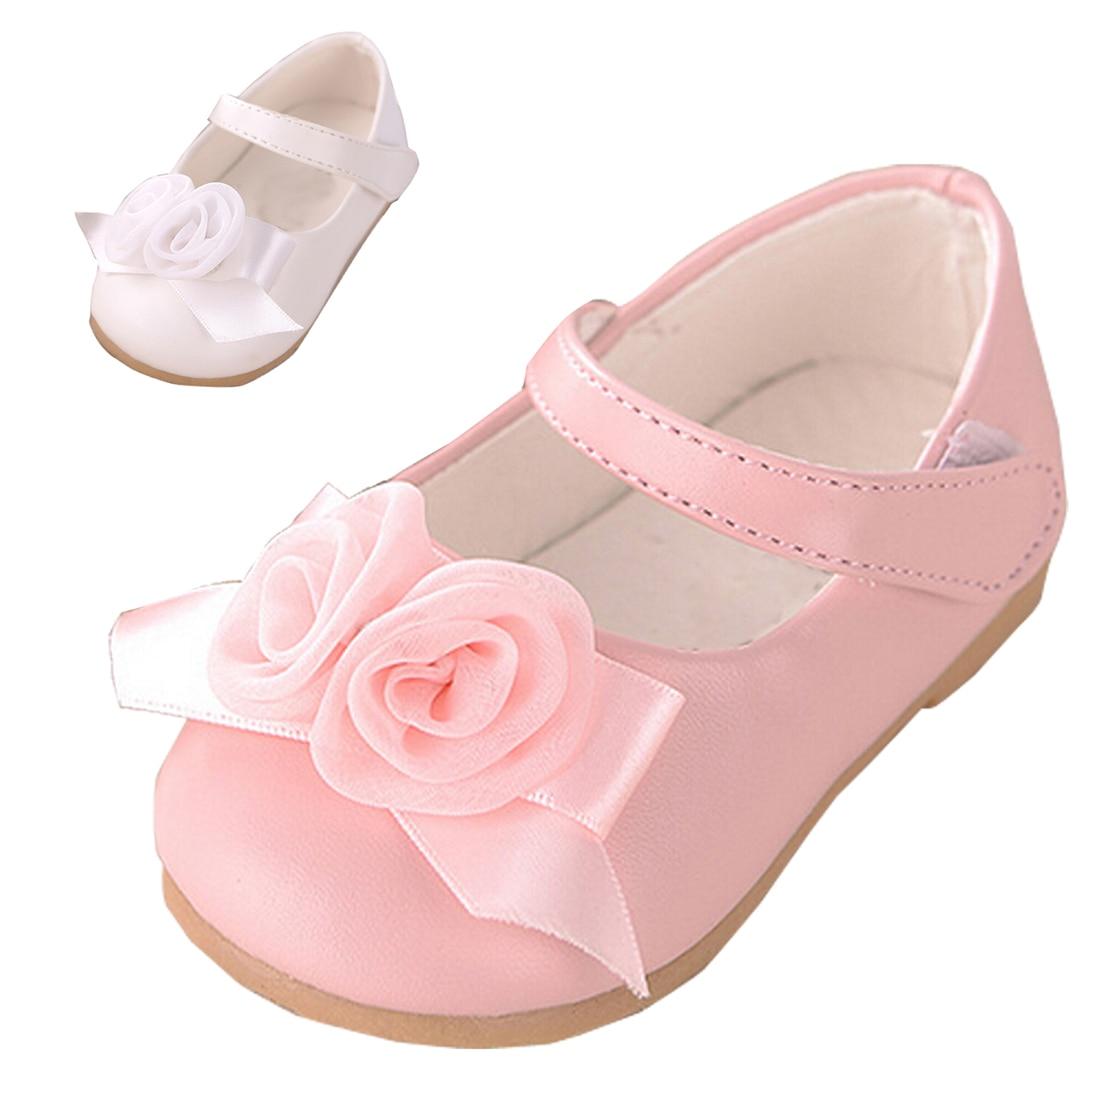 Kinder Rosa Baby Mädchen Nette Frühling Blumen Schuhe 80vnwOmN